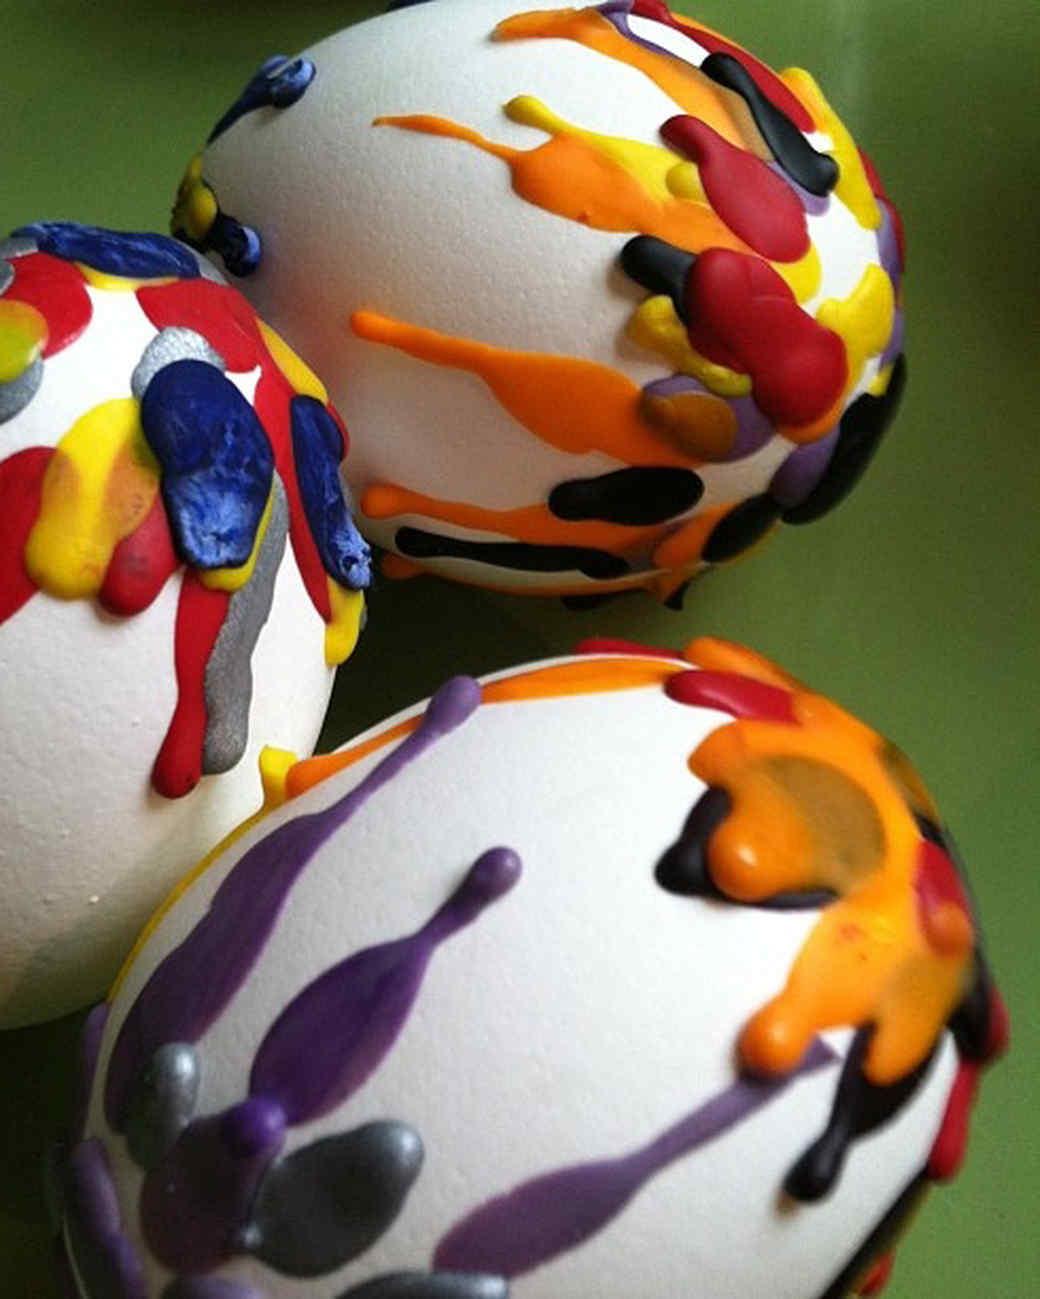 marthas-egg-hunt-princesnowfarm-0414.jpg